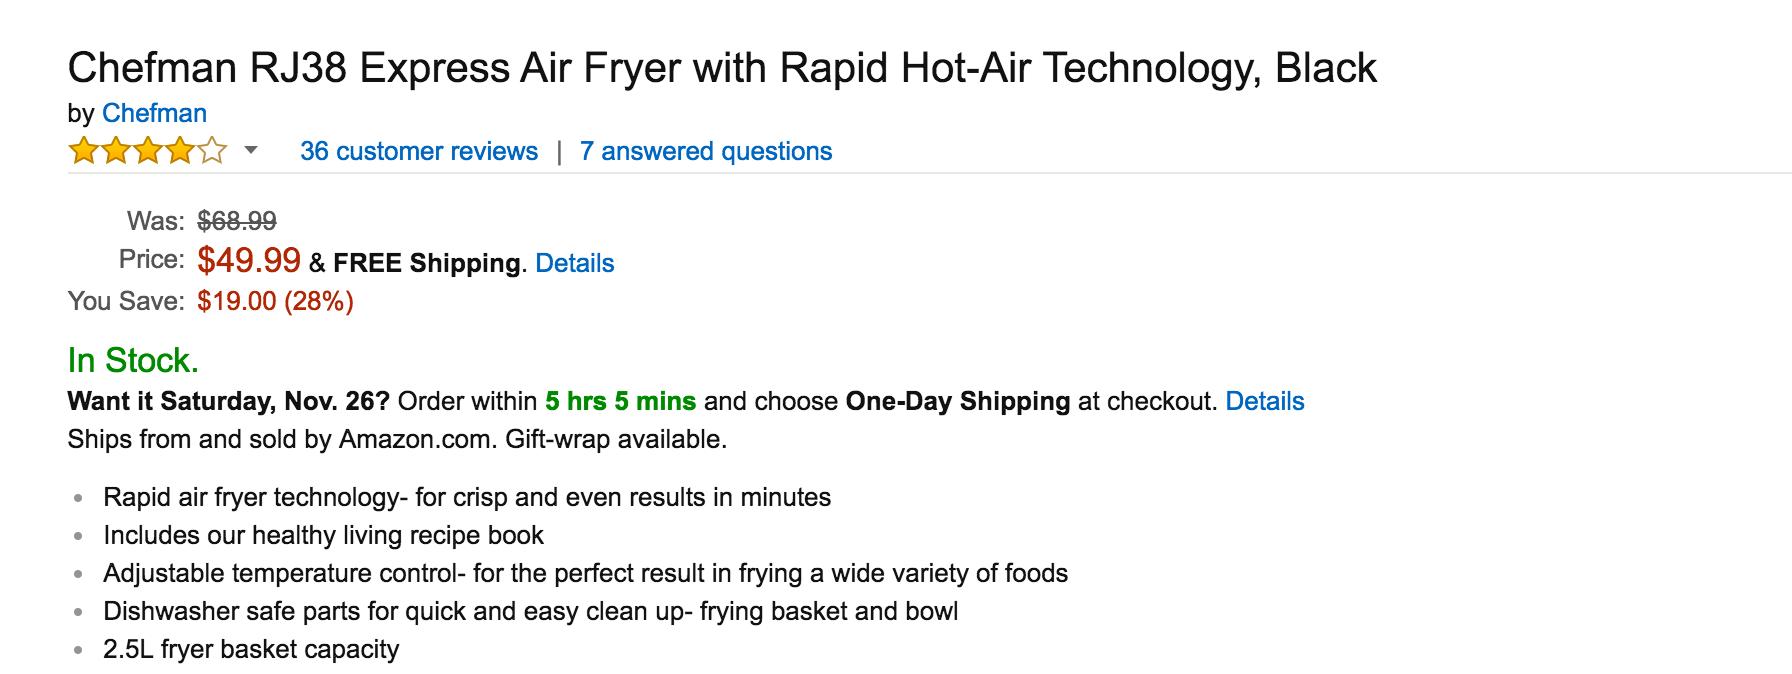 chefman-rj38-express-air-fryer-with-rapid-hot-air-technology-5